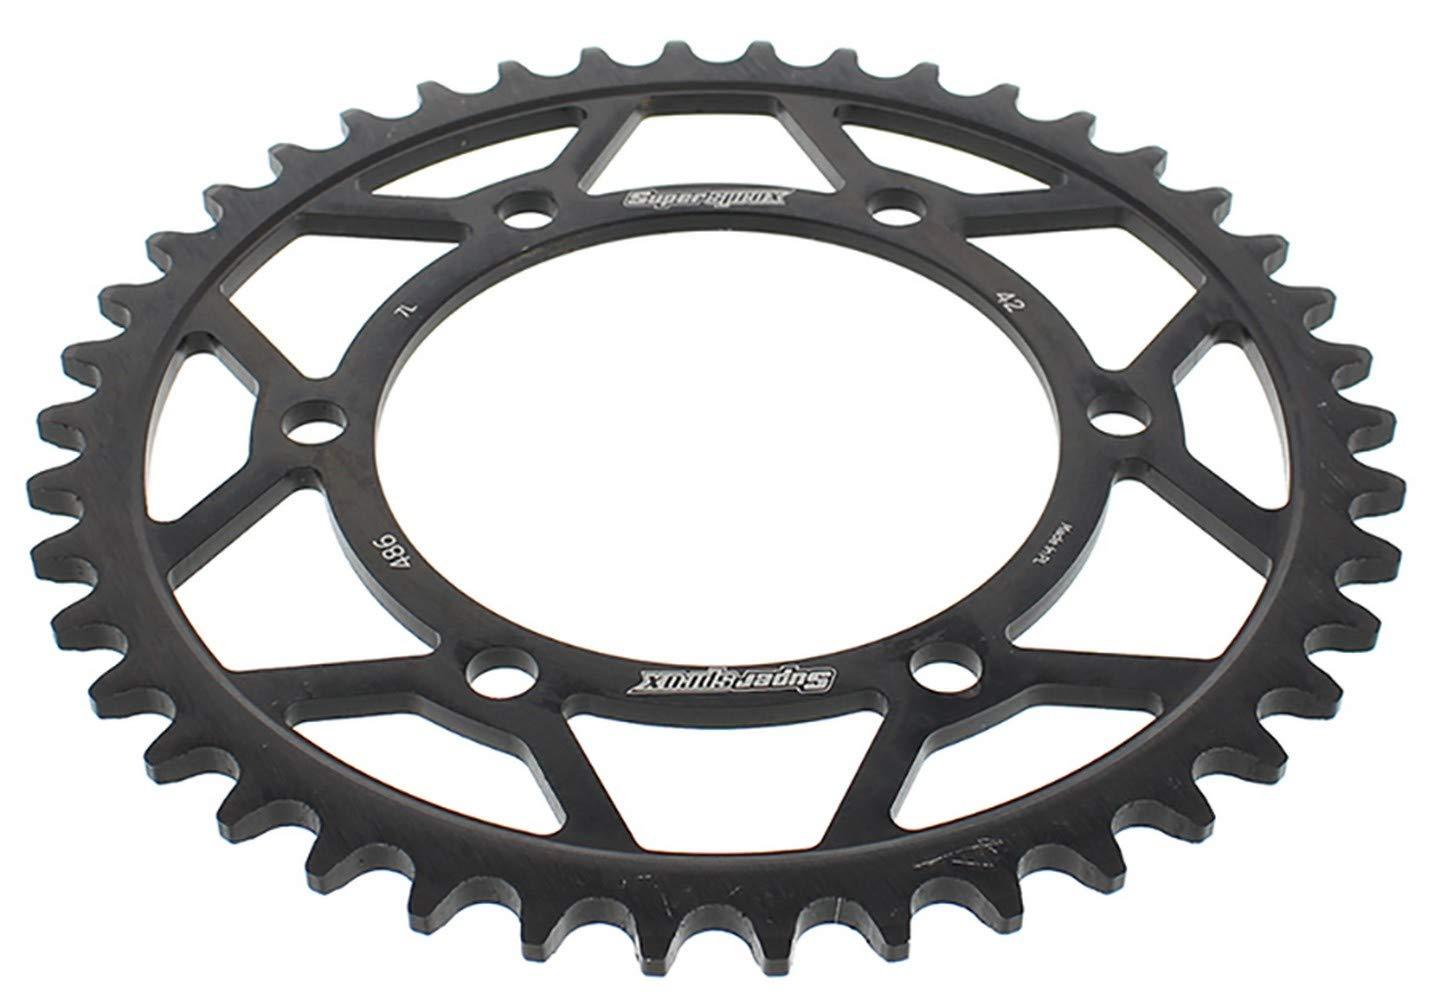 Amazon.com: Supersprox Steel Sprocket Black 42T - RFE-486-42 ...